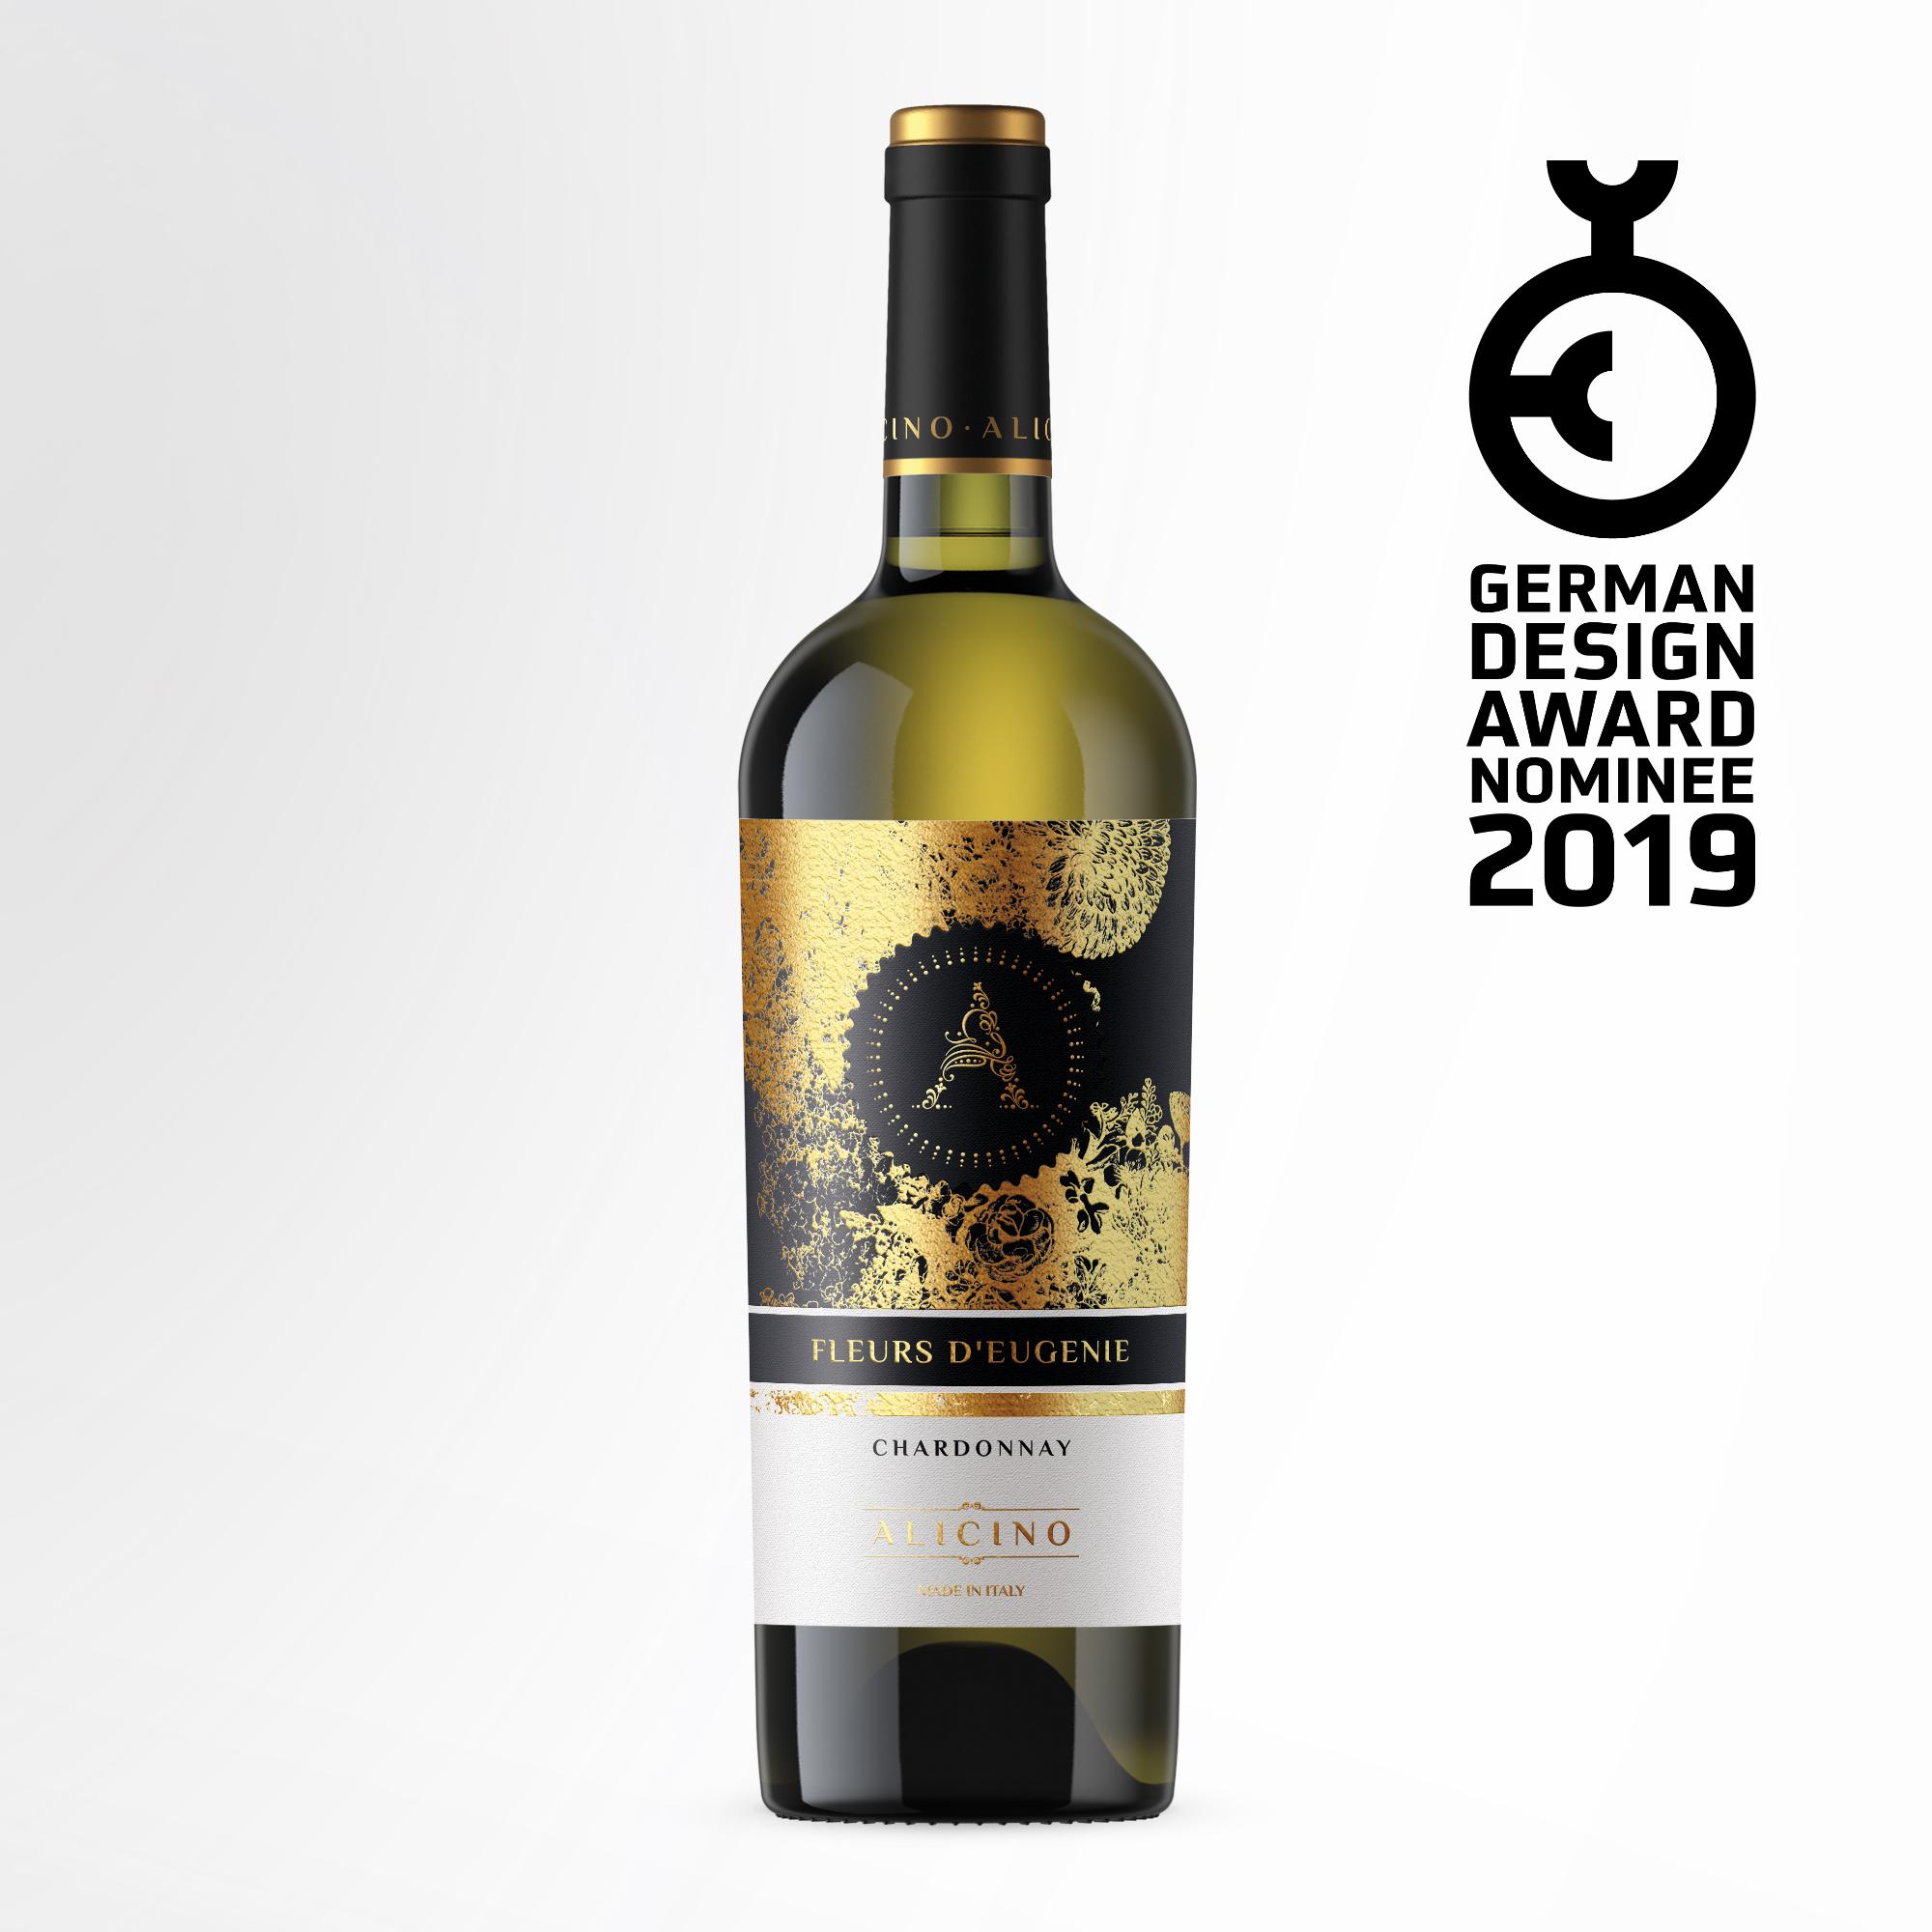 German design award nominee 2019